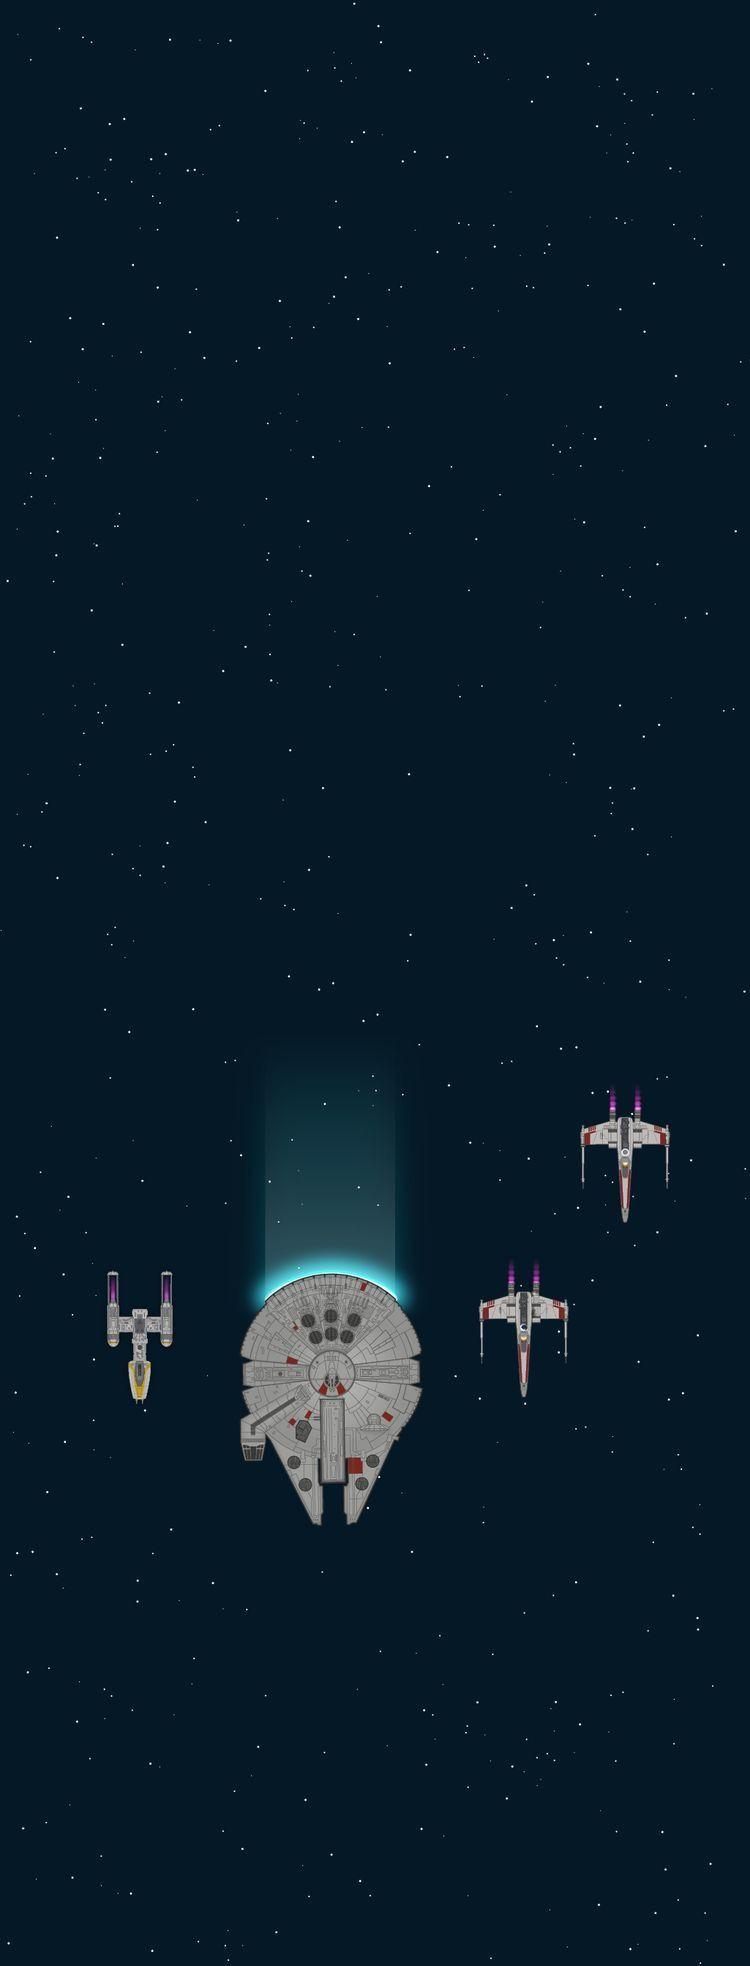 Pin de Javi en Star Wars | Pinterest | Guerra de las galaxias ...